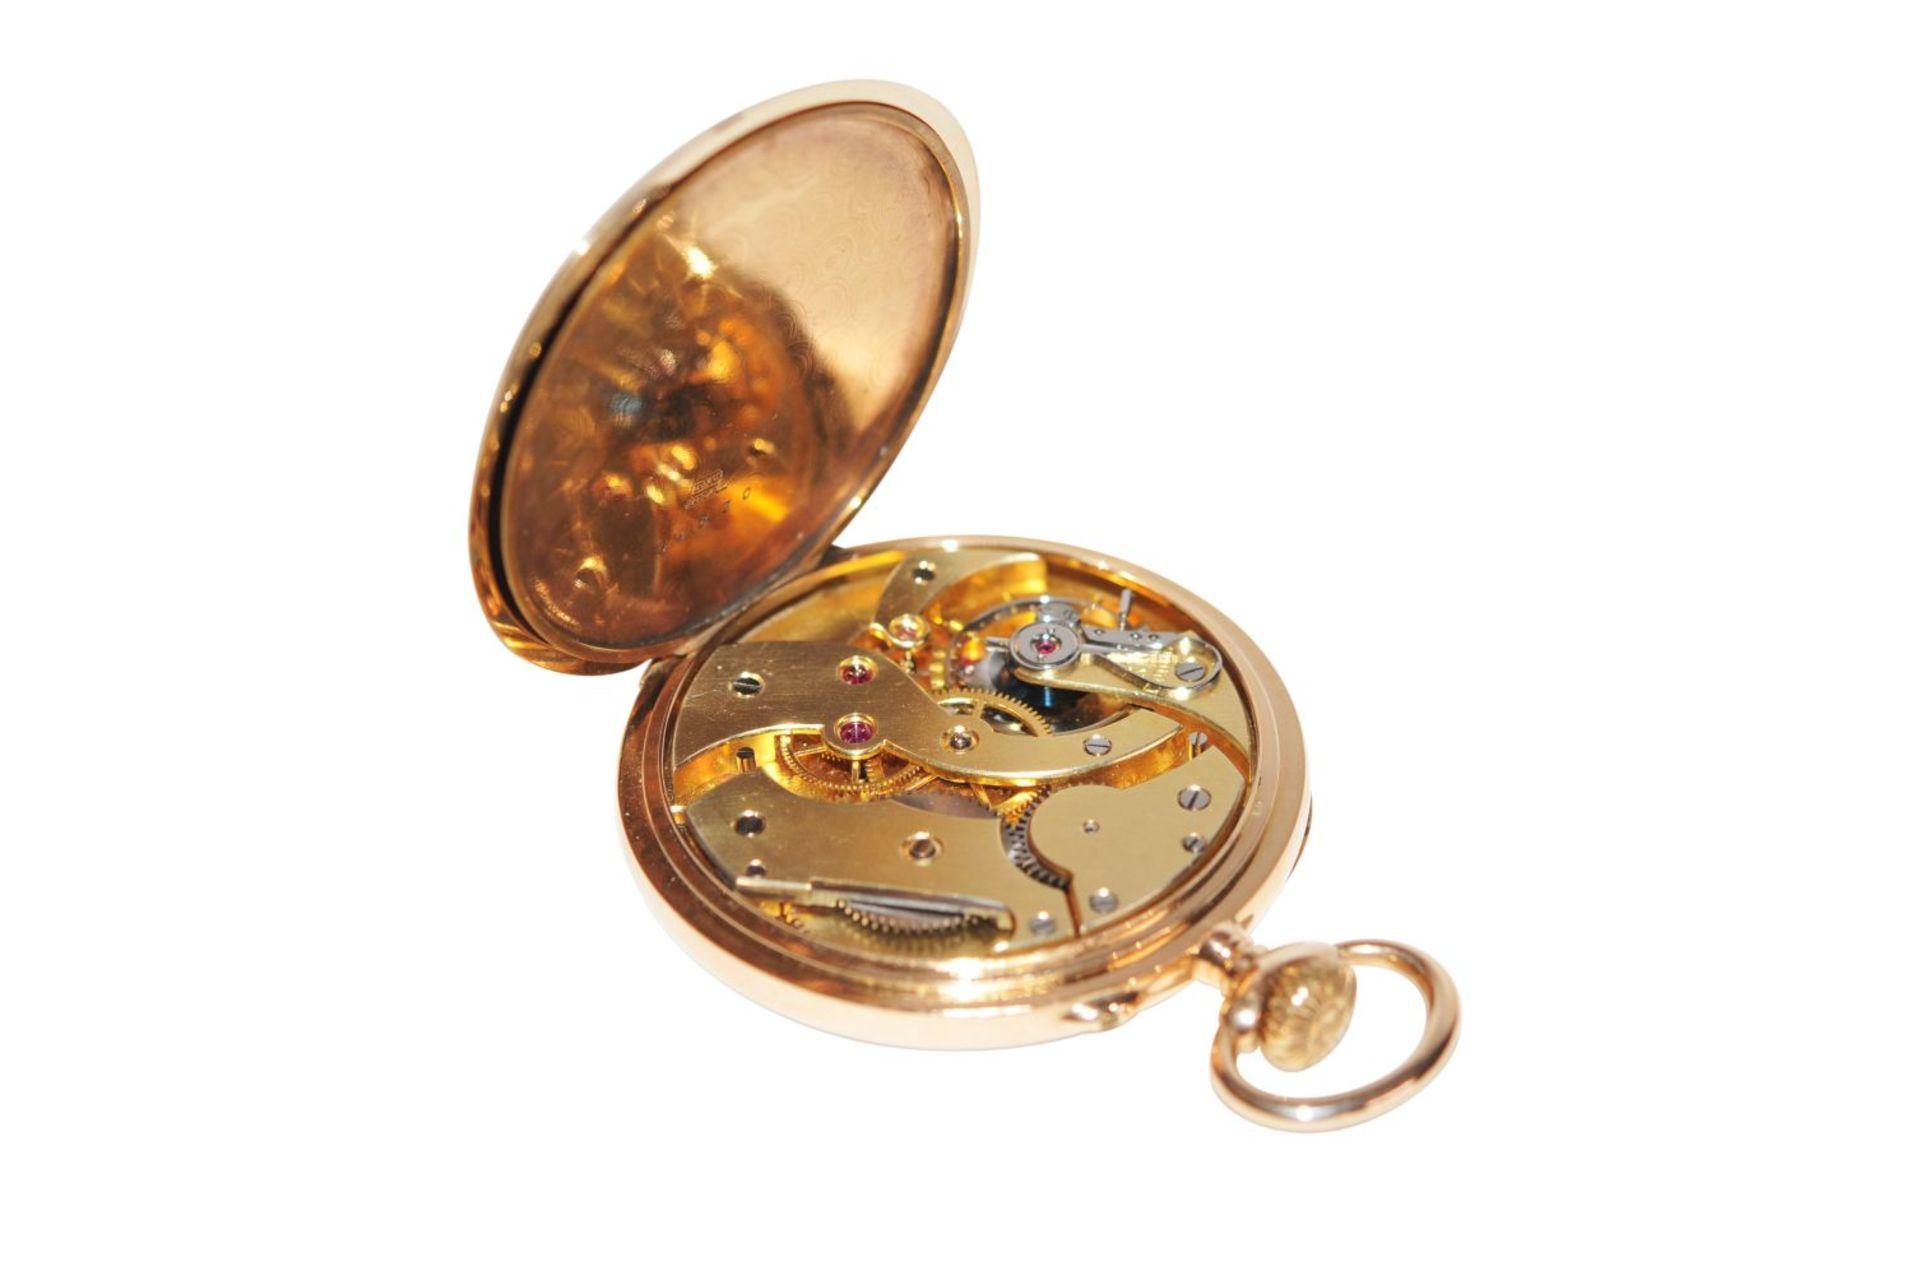 Los 81 - Axel Hüning14K gold Lepine pocket watch from the master Alex Hüning ca 1890, fine Swiss bridge